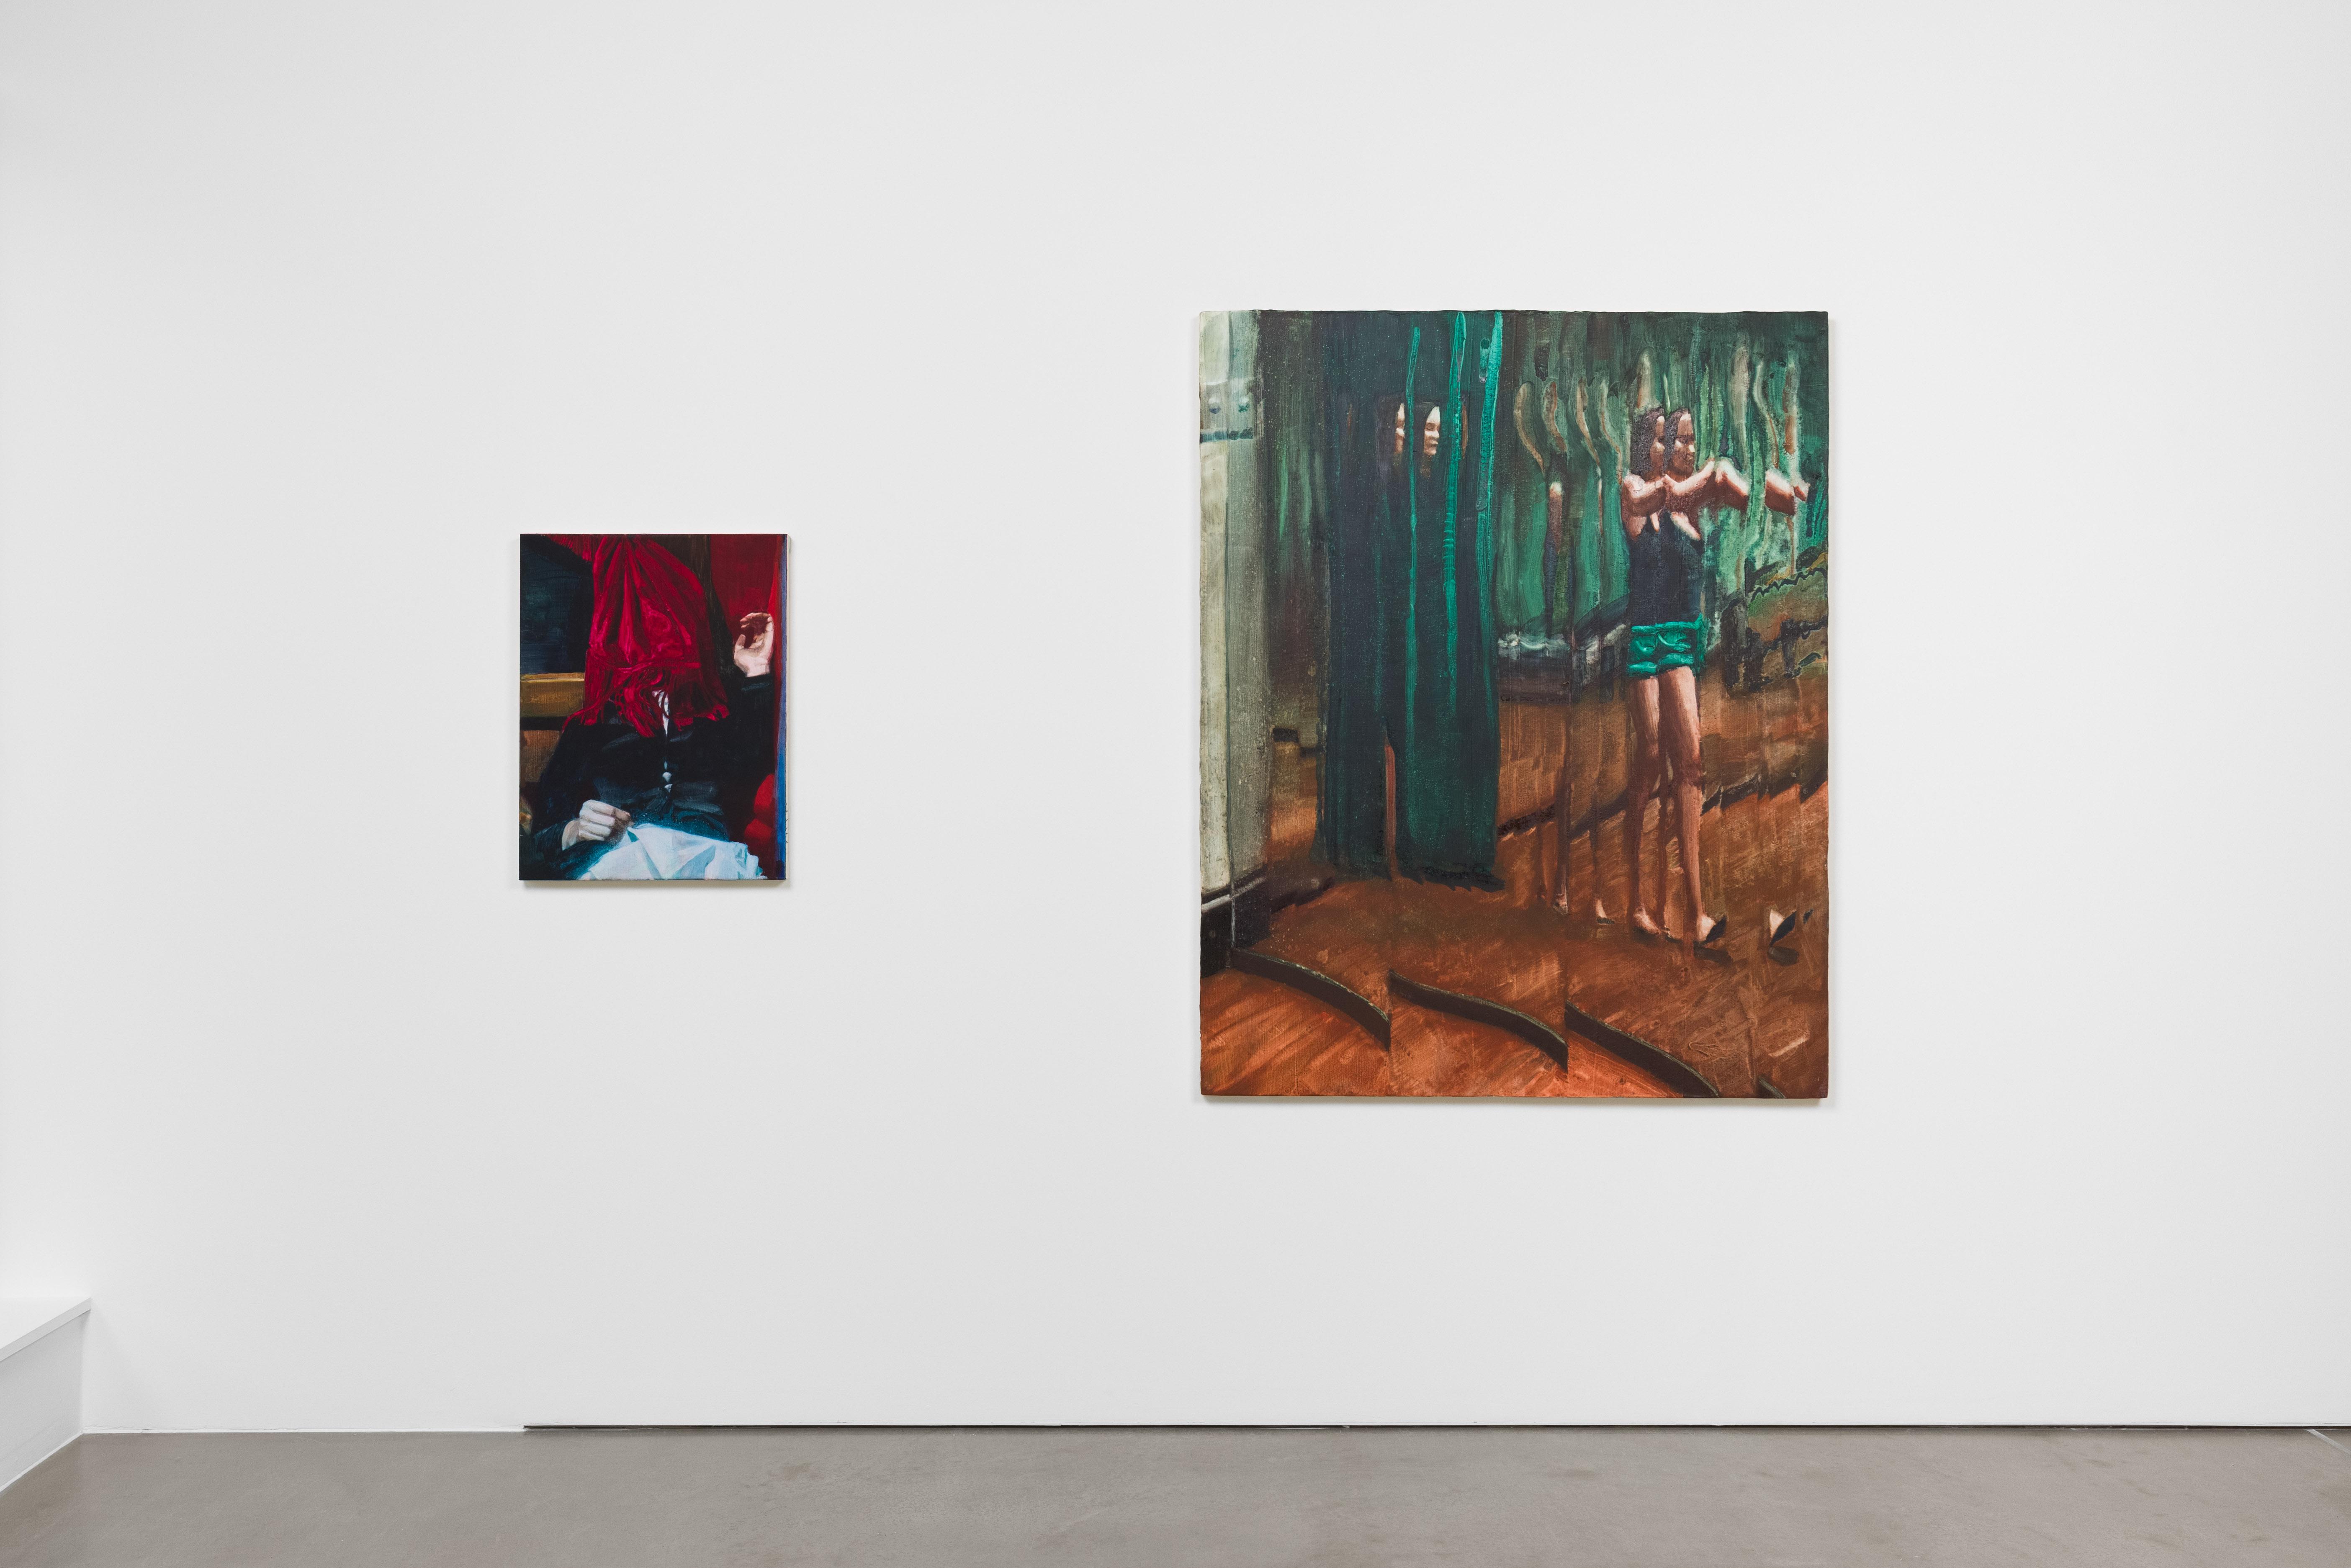 Installation view: Joseph Yaeger: Doublespeak, Project Native Informant, 4 Jun 2021 – 10 Jul 2021. All images: Courtesy of the artist and Project Native Informant, London